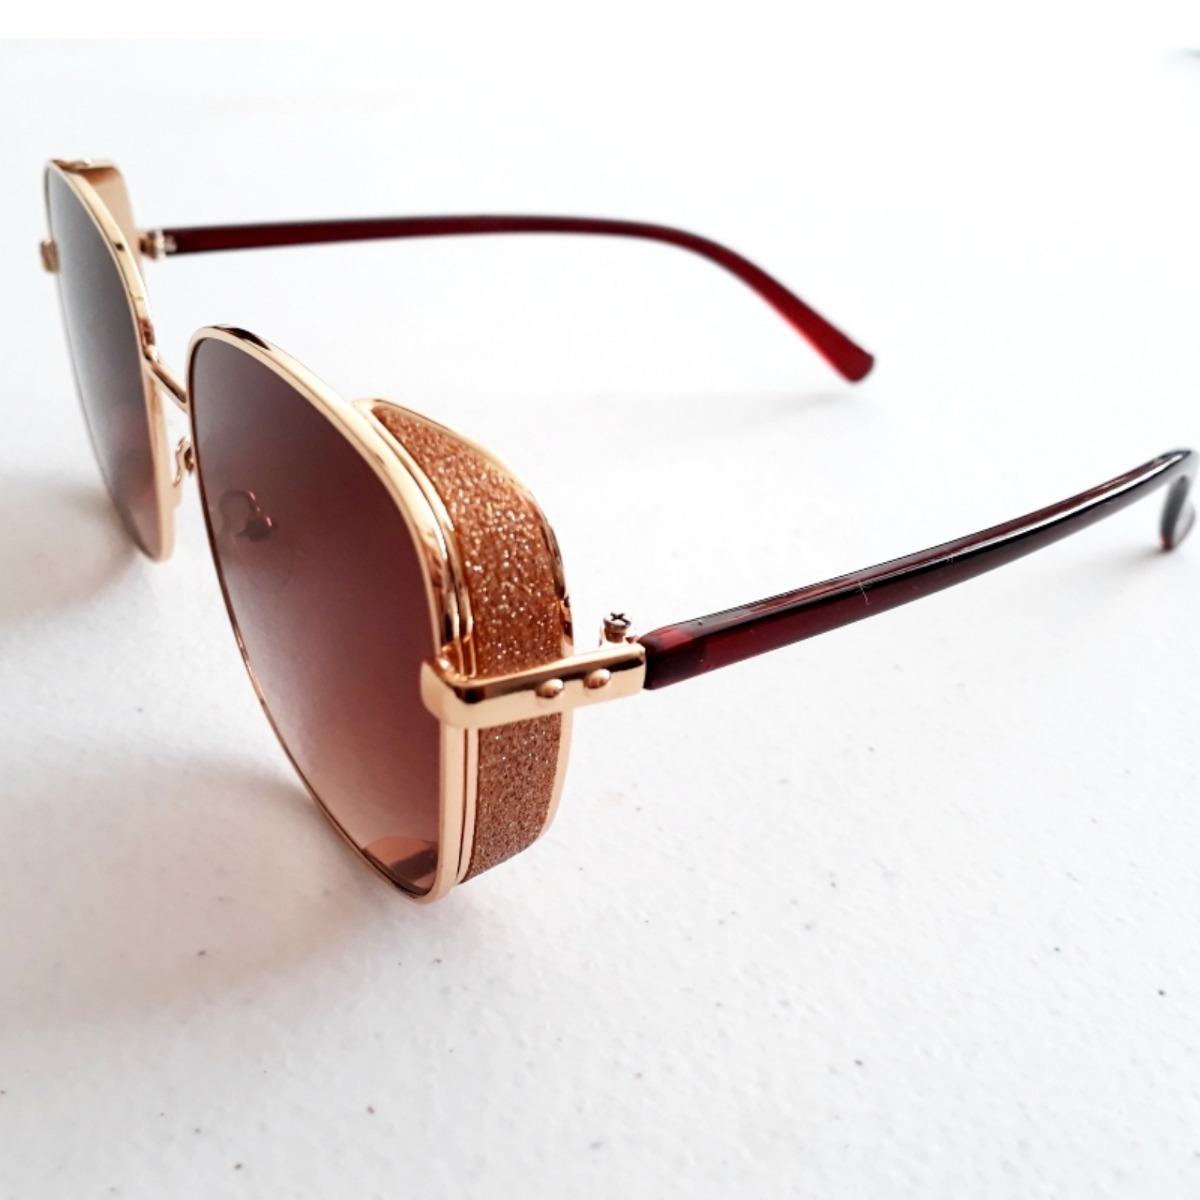 72d19b6df5 lentes de sol estilo matsuda de dama cafe moda verano 2019. Cargando zoom.